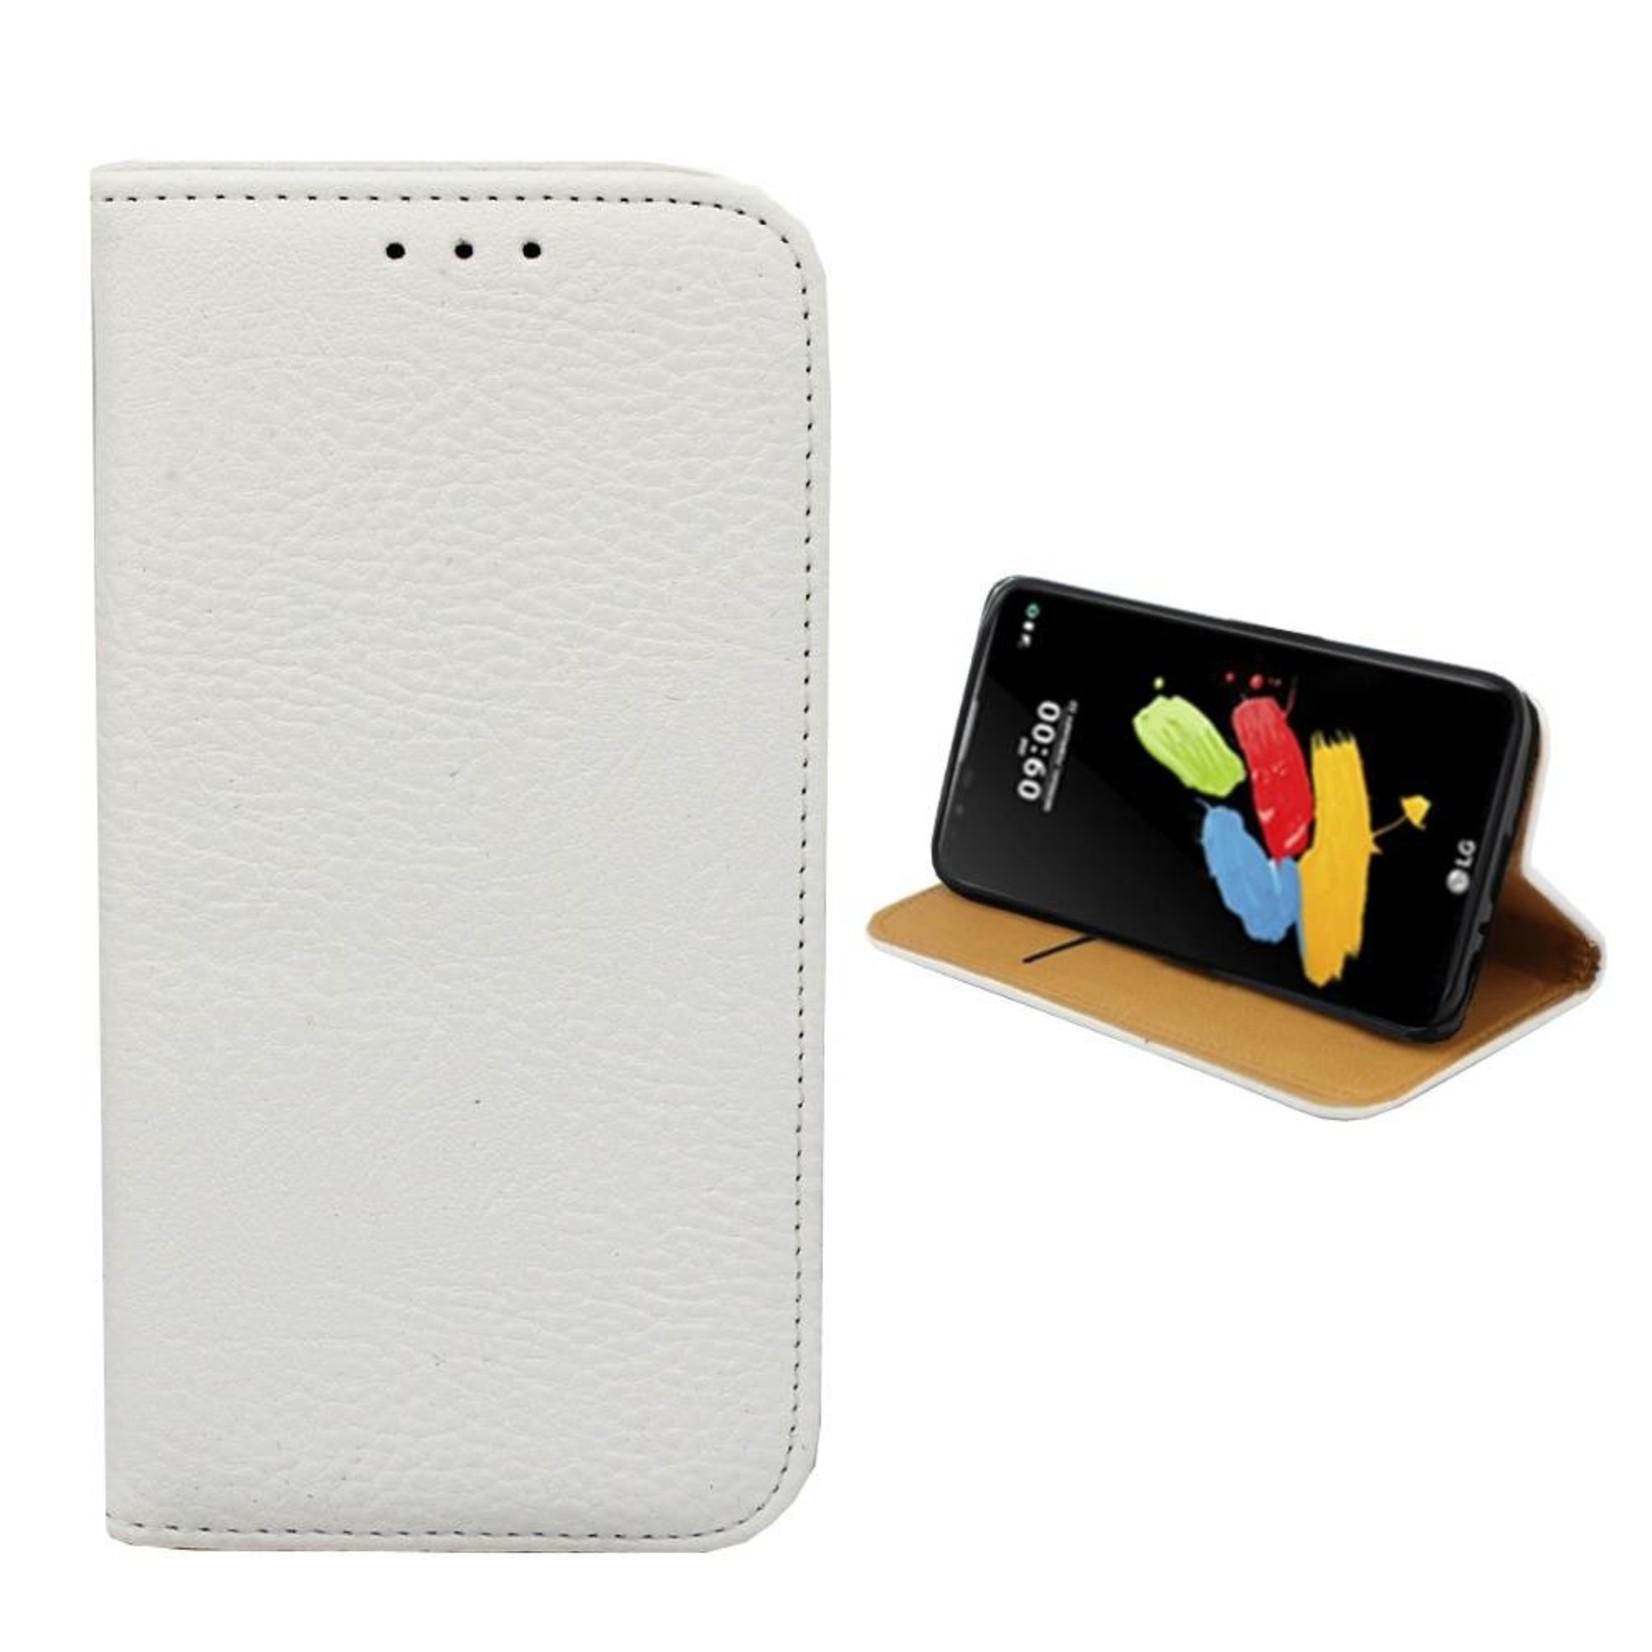 Colorfone Hoesje Book voor LG Stylus 2/Plus Wit